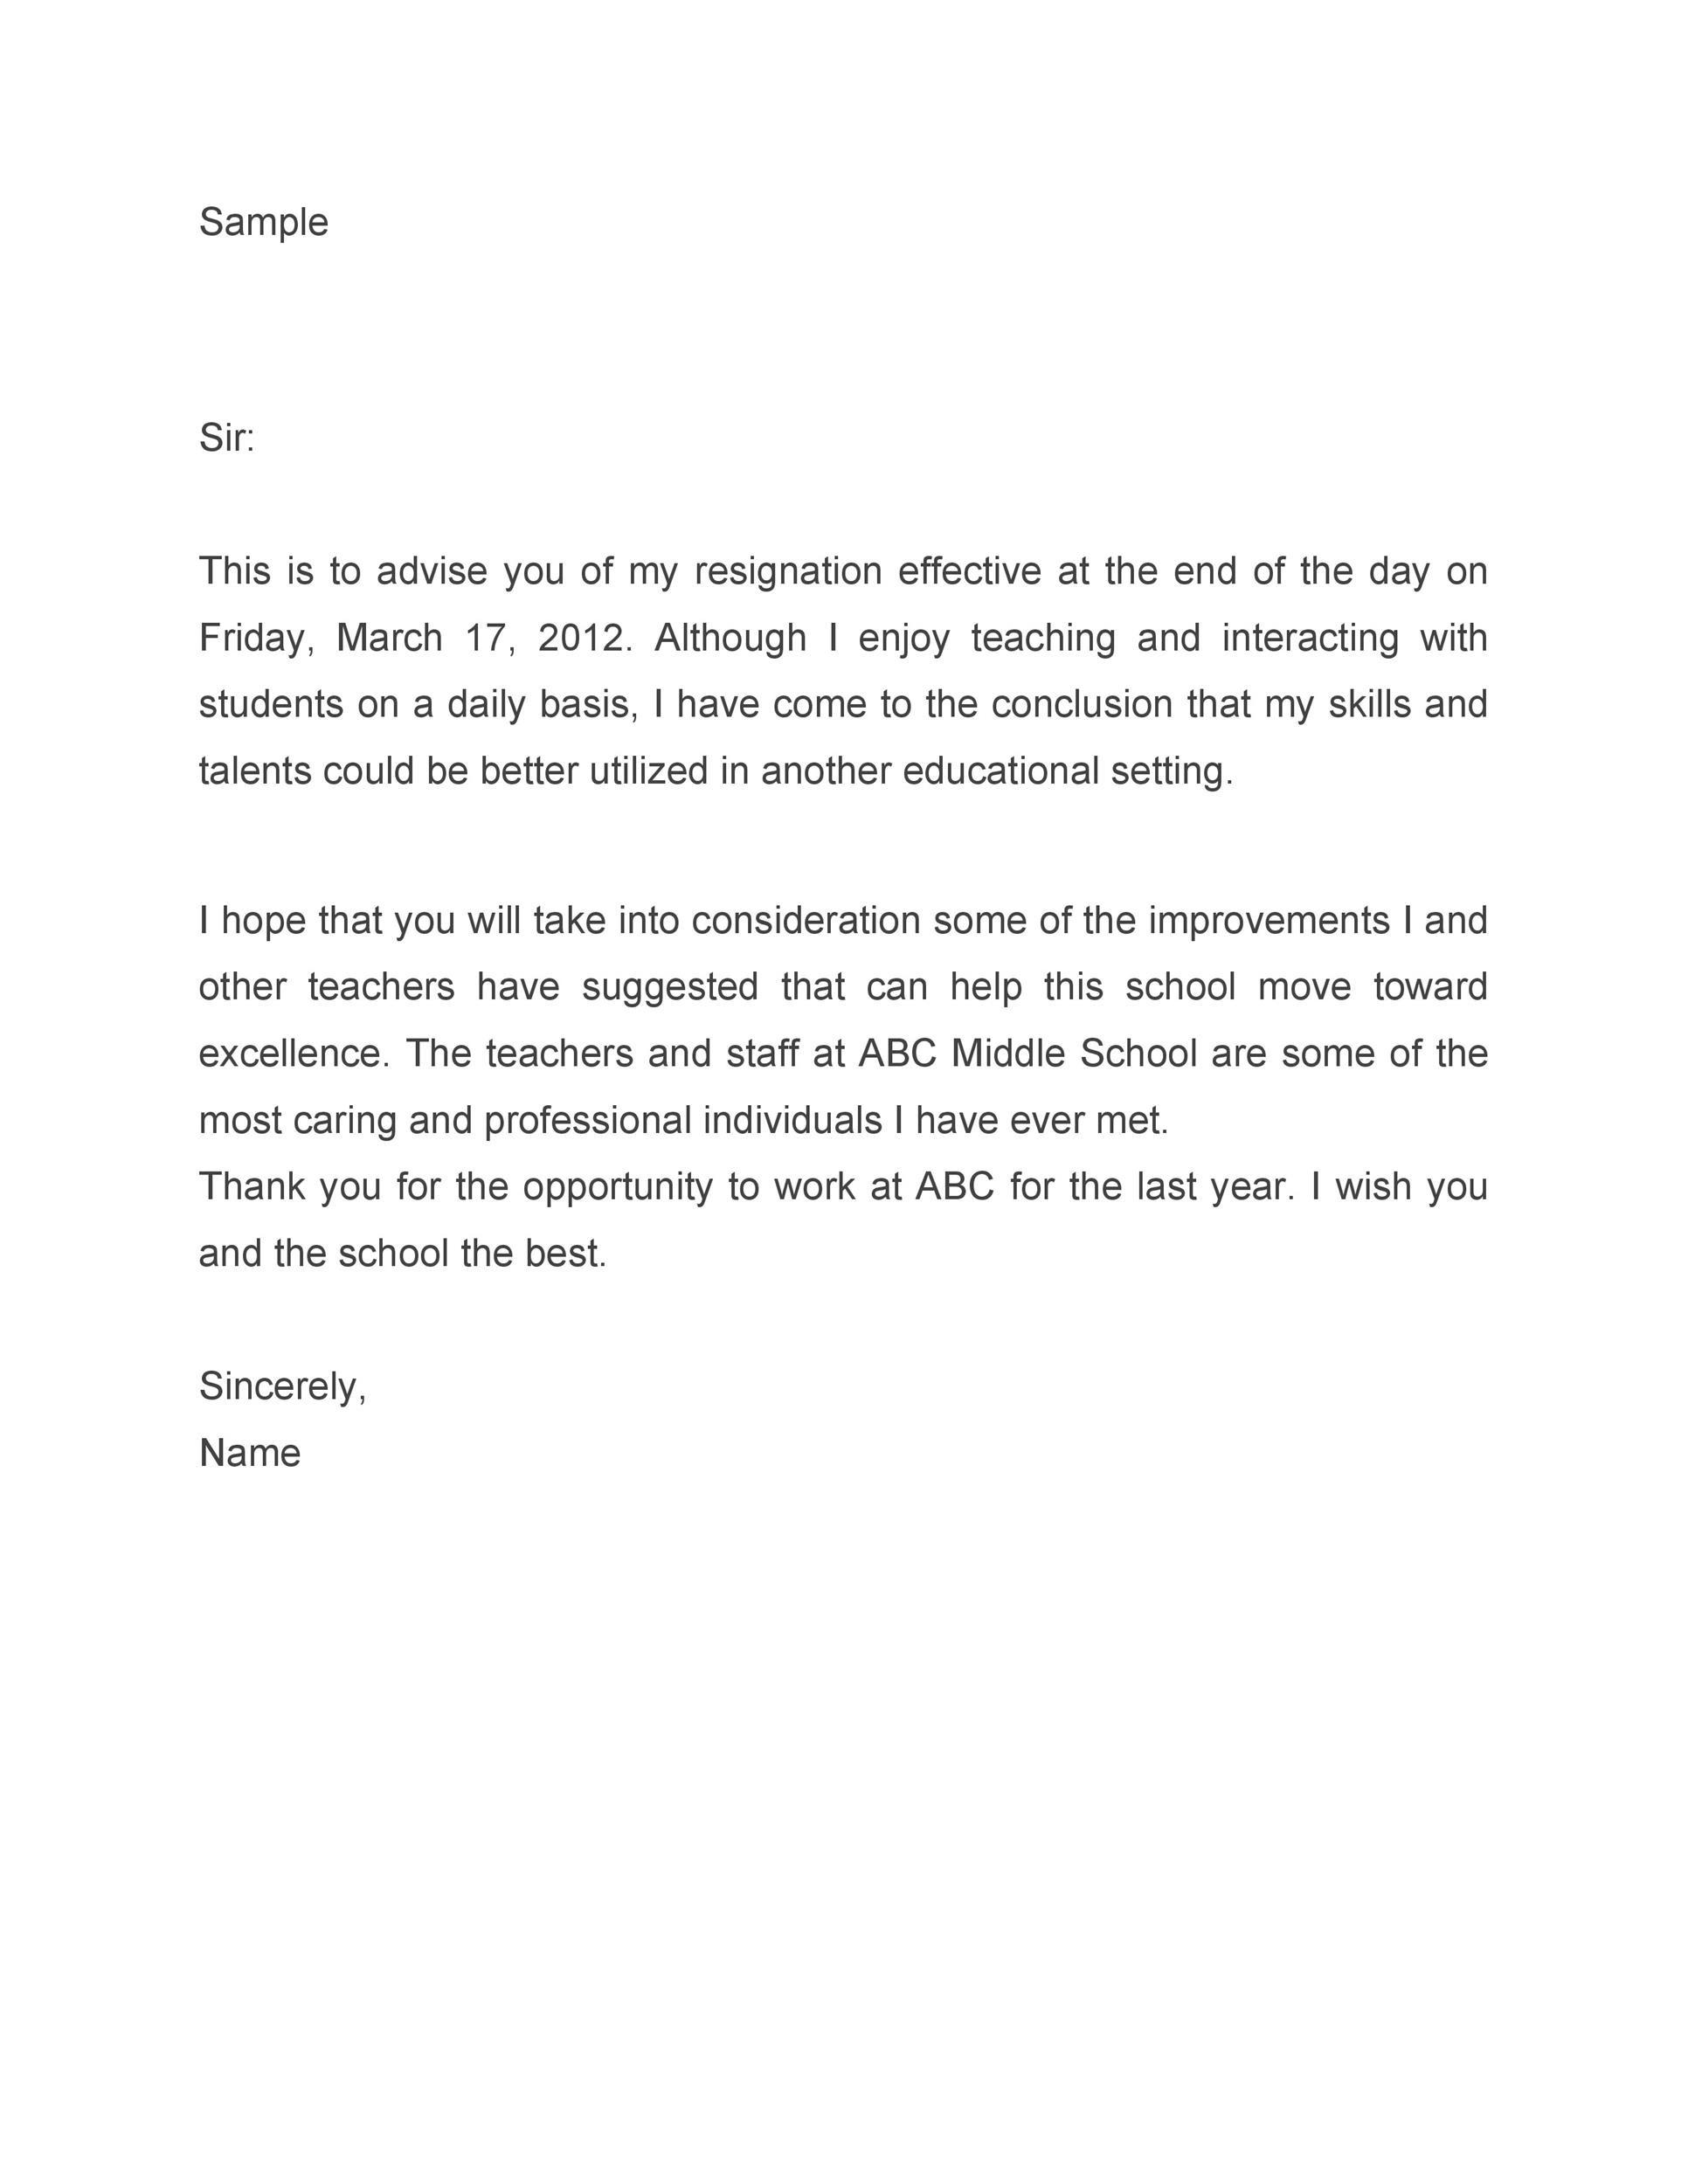 Teacher Resignation Letter For Another Job from templatelab.com